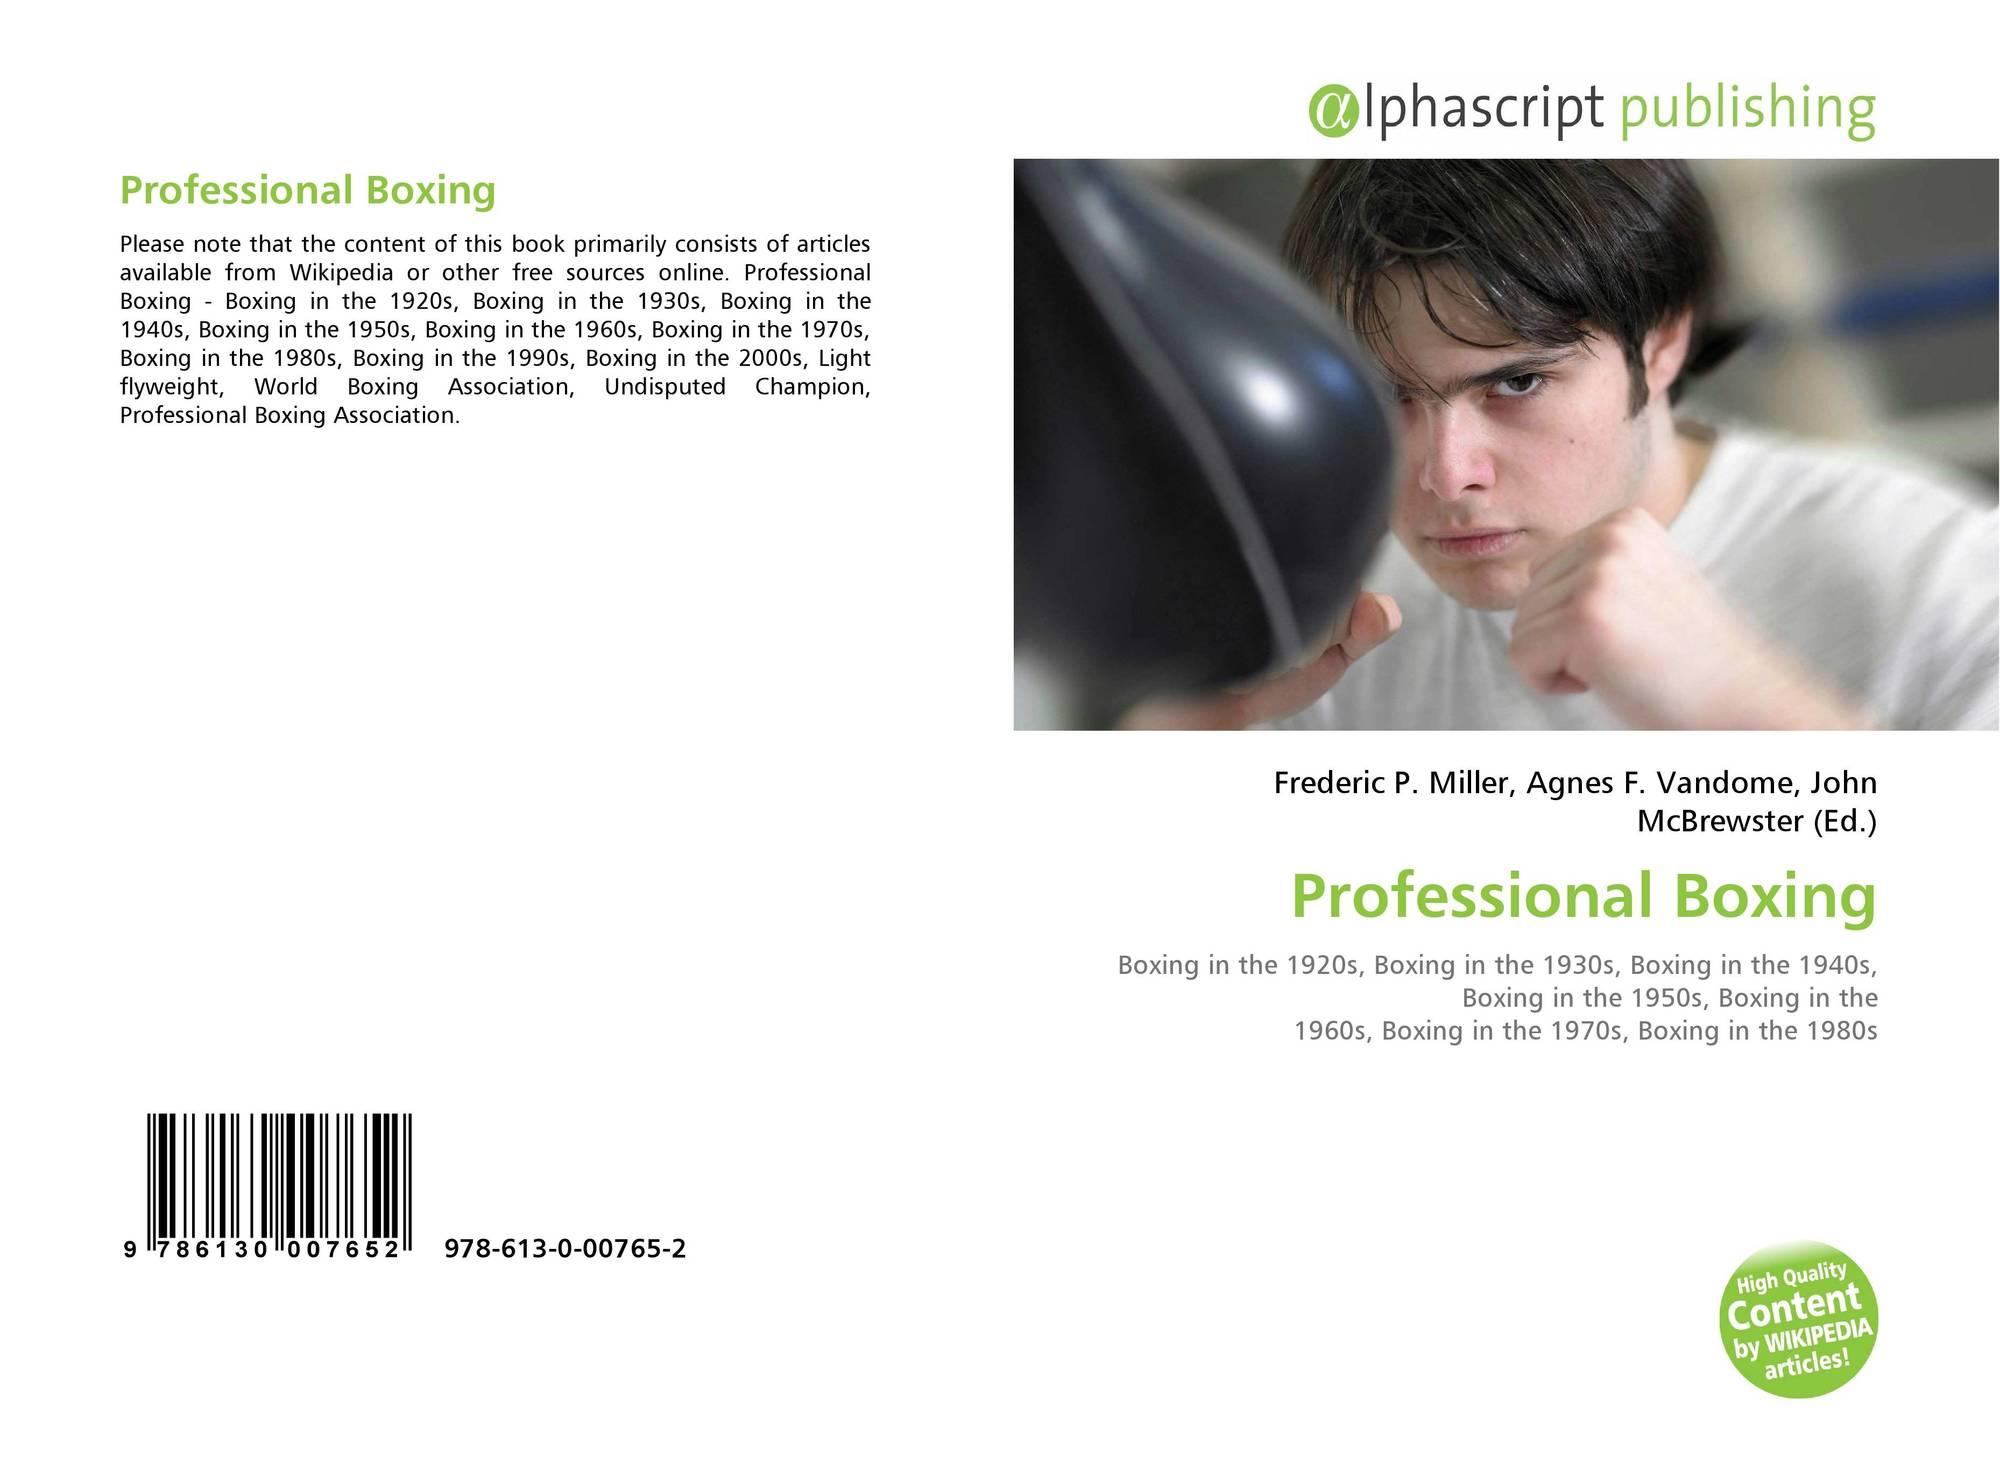 Professional Boxing, 978-613-0-00765-2, 6130007655 ,9786130007652